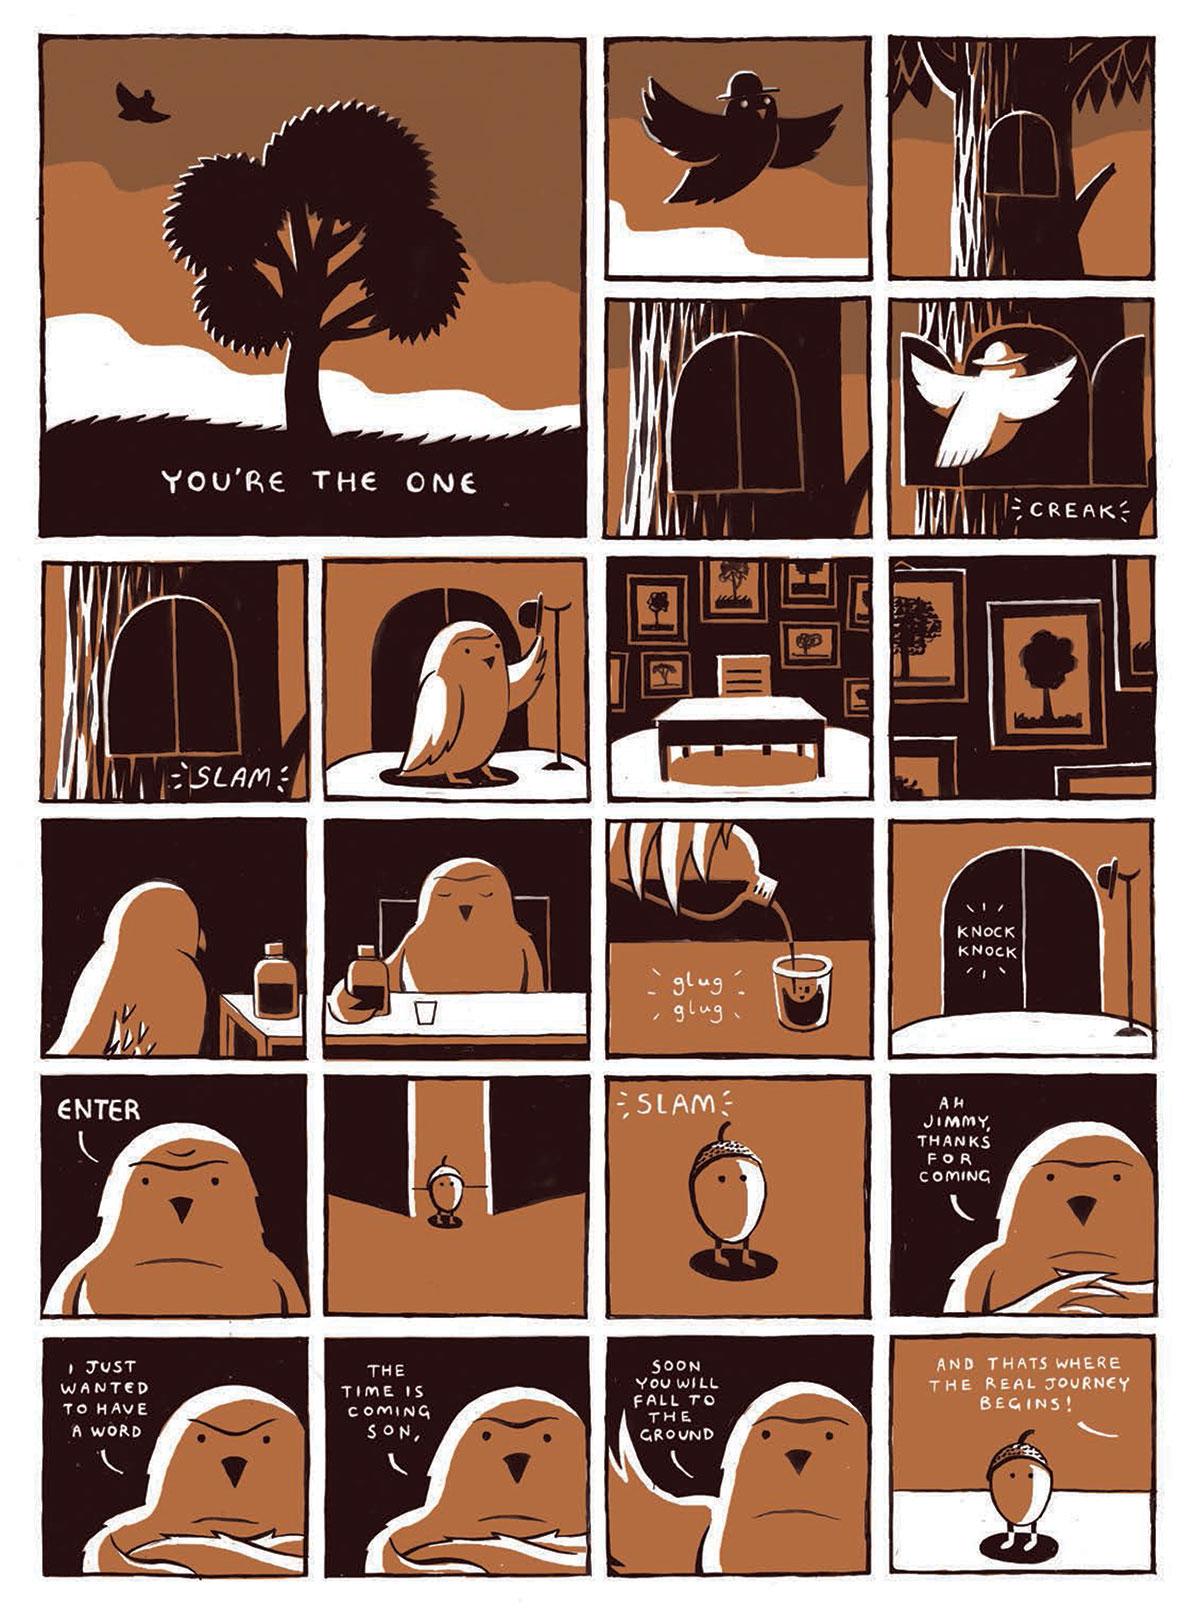 Hiut-yearbook-one-comic